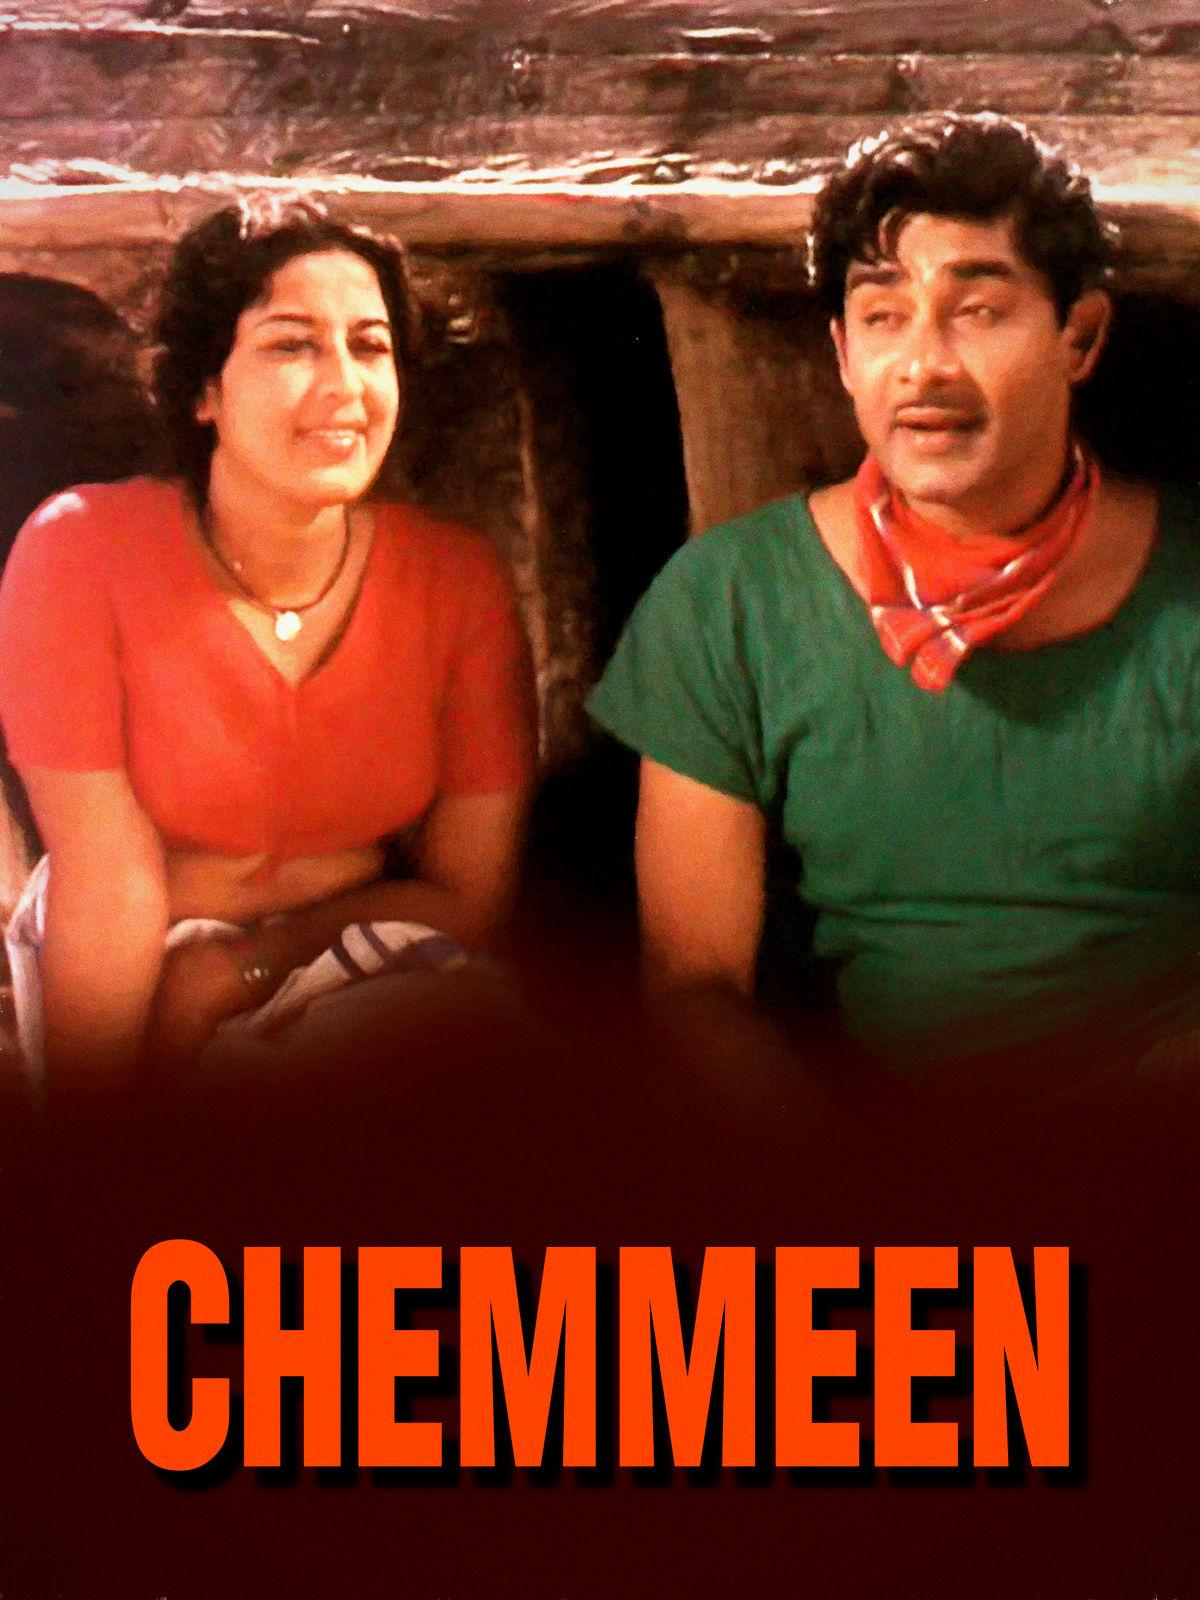 Chemmeen